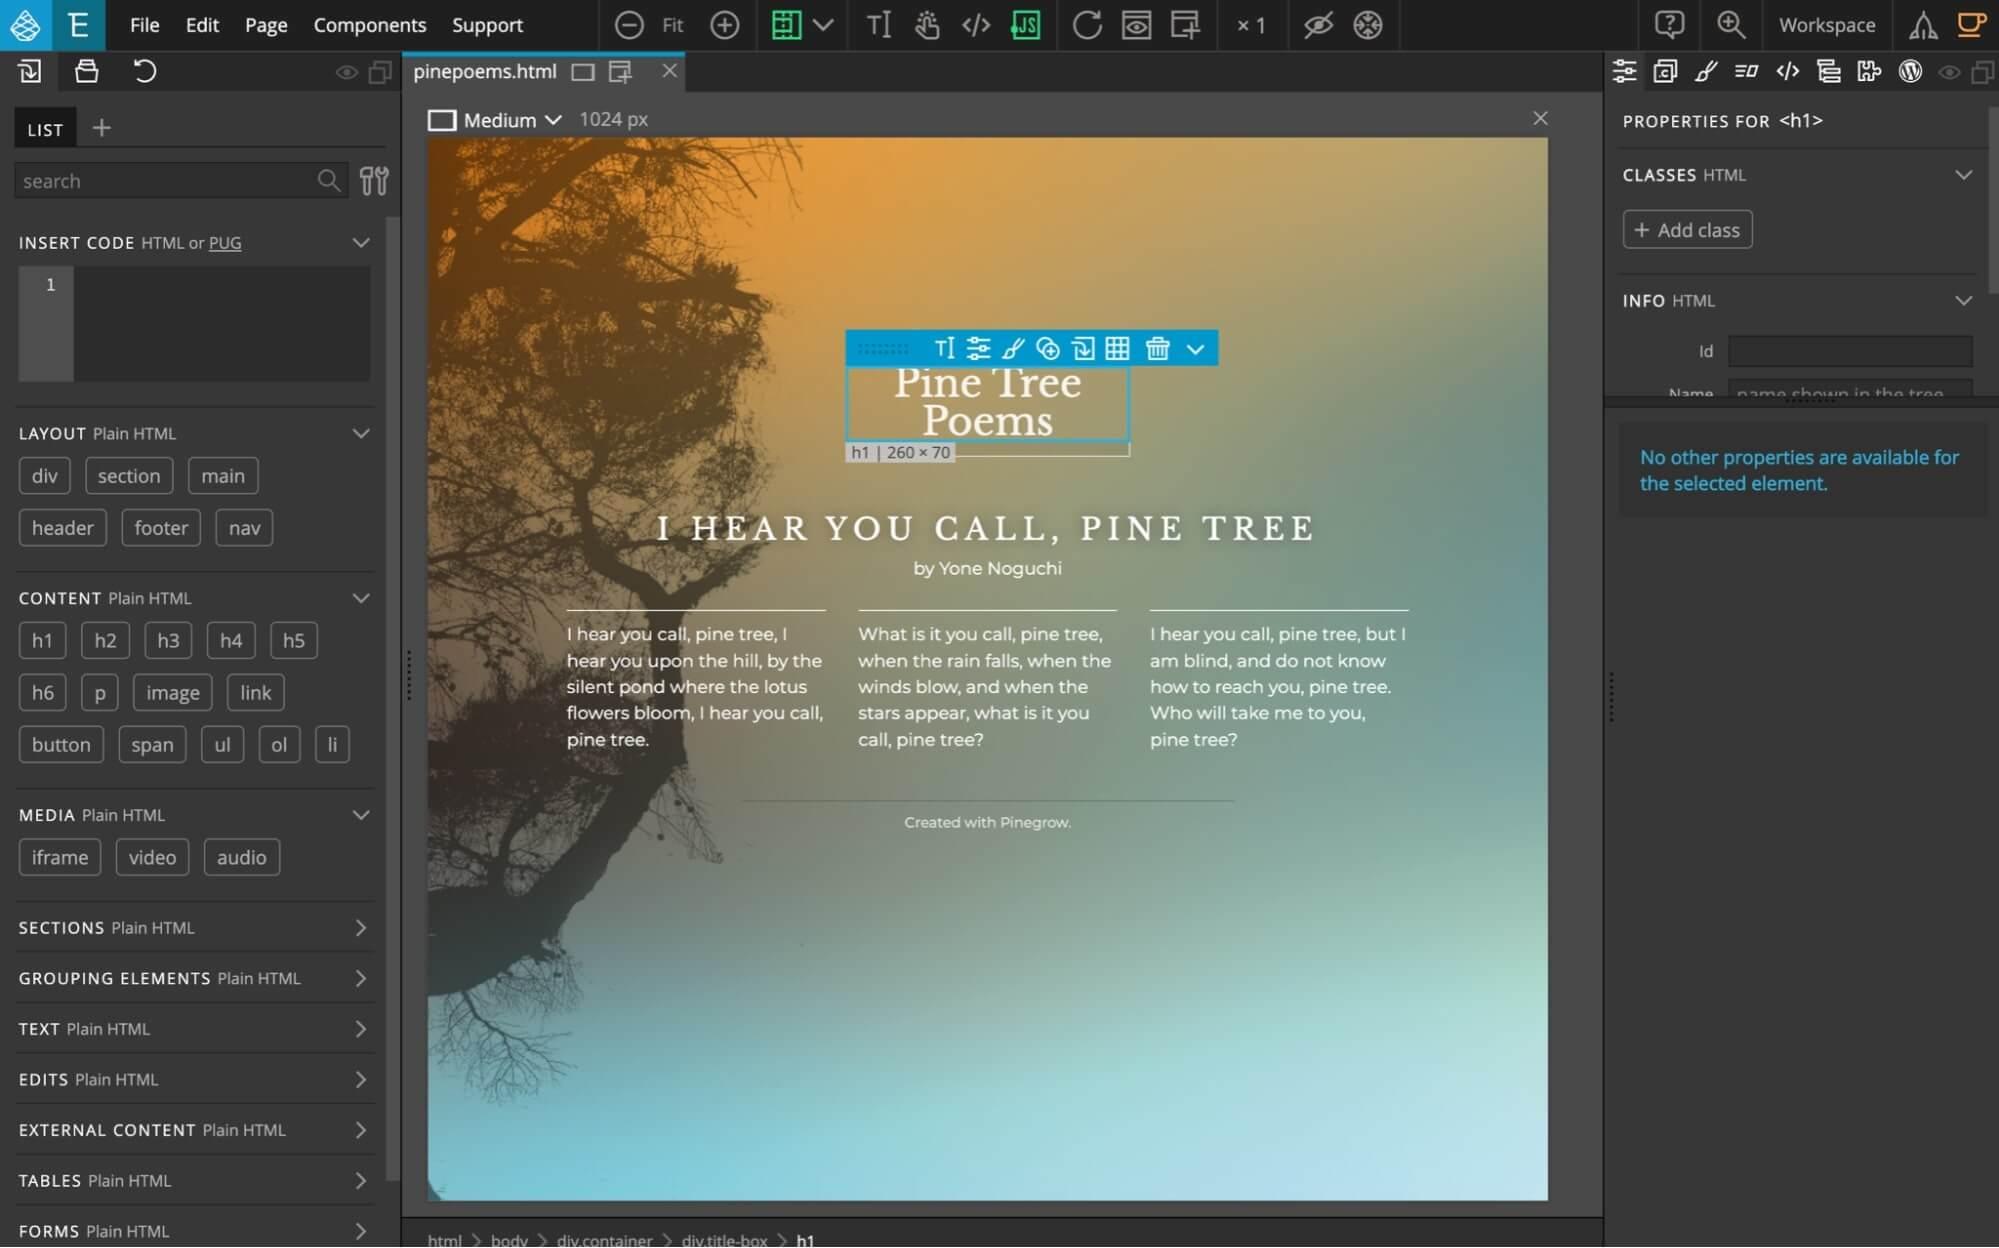 Pinegrow web editor interface